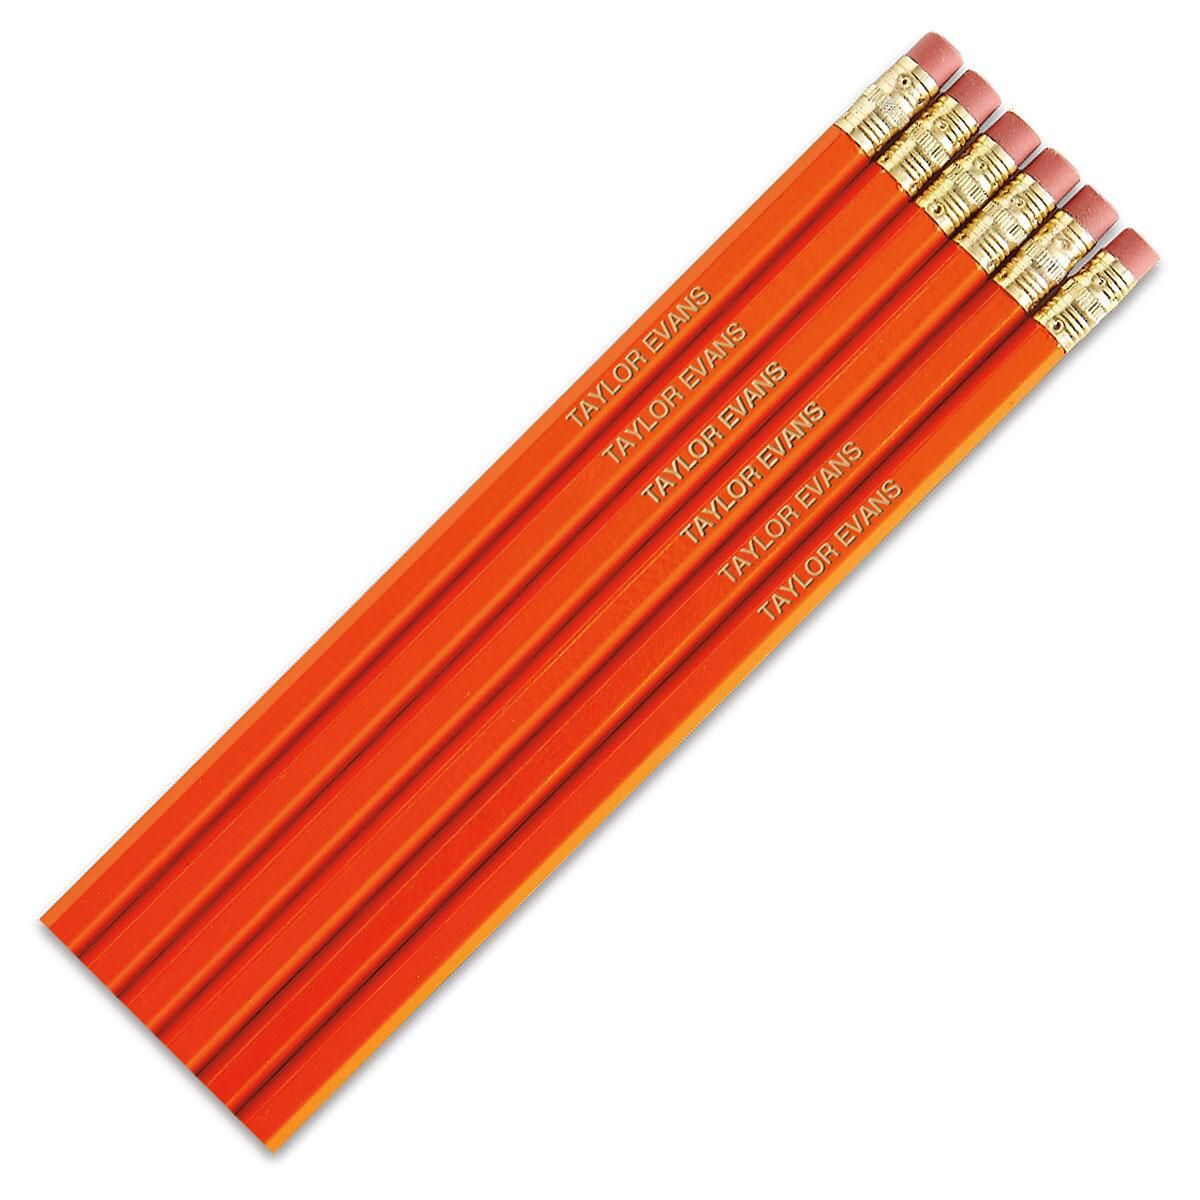 Orange Personalized Pencils